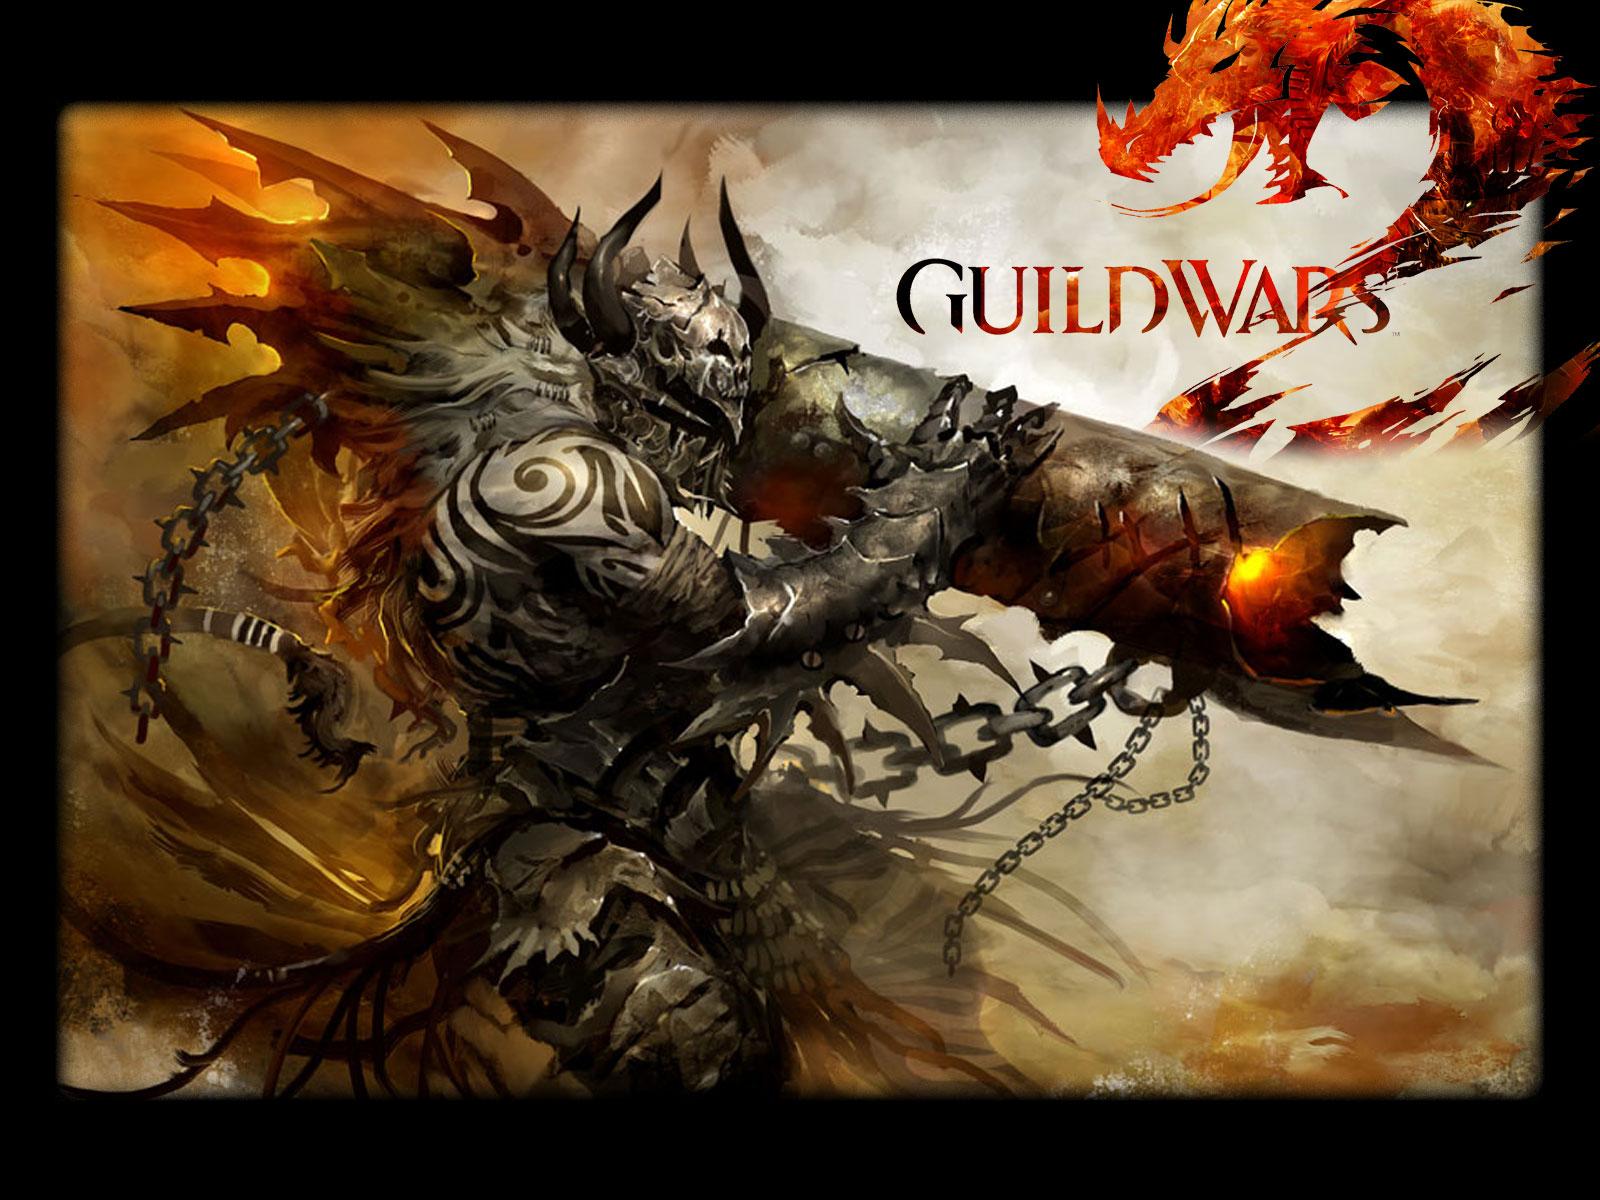 http://1.bp.blogspot.com/-3BryvDWSnnc/UF8VUqZRnZI/AAAAAAAAAQo/qvSWK32M-7A/s1600/guild-wars-2-wallpaper-18.jpg